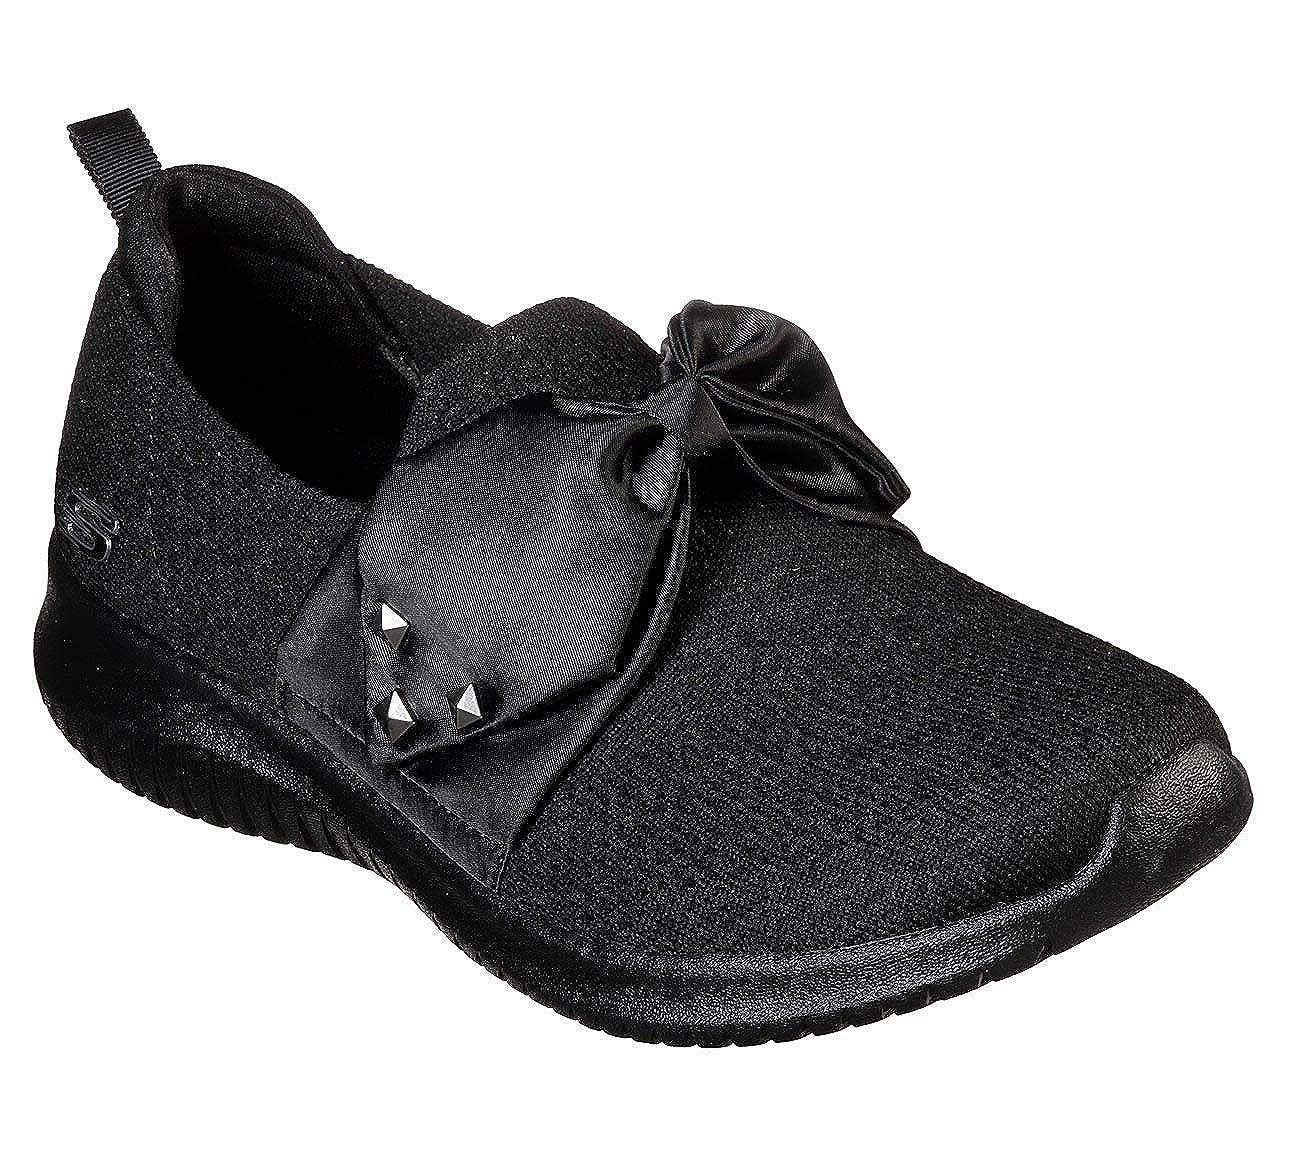 6a87948da5 Amazon.com | Skechers Ultra Flex Satin Night Womens Slip On Sneakers |  Walking